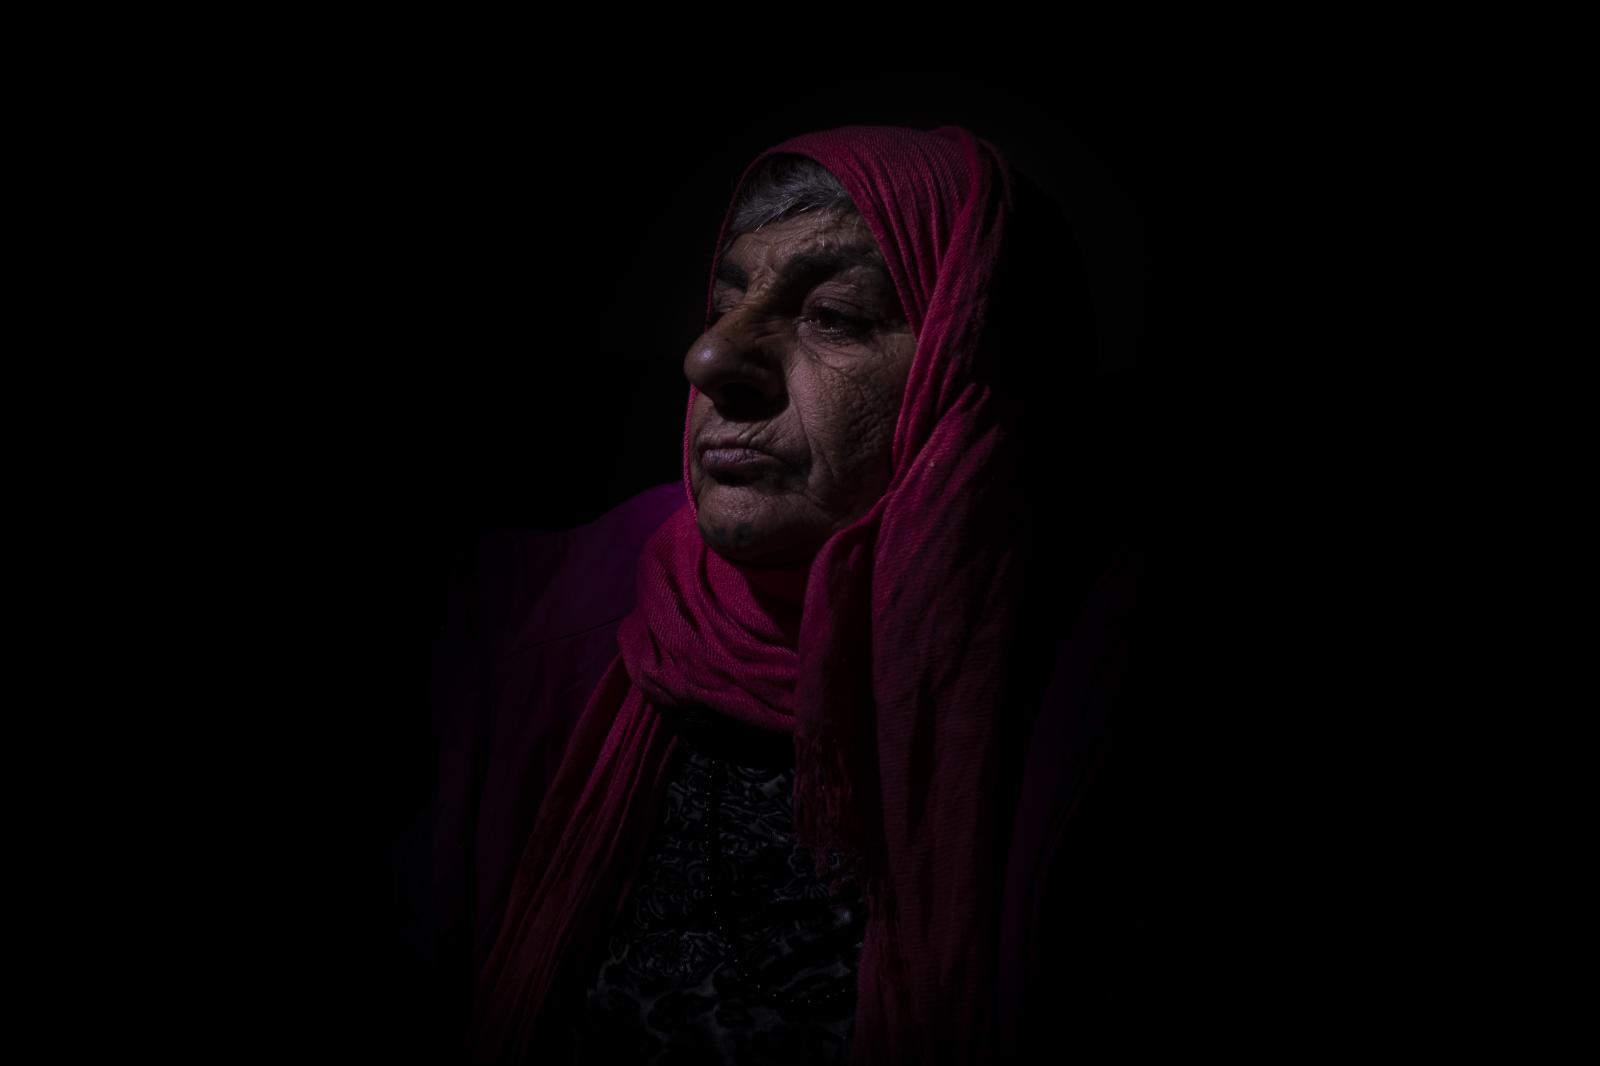 Photography image - Loading Rojava-Lubaki-Photographer-Refugee24.jpg